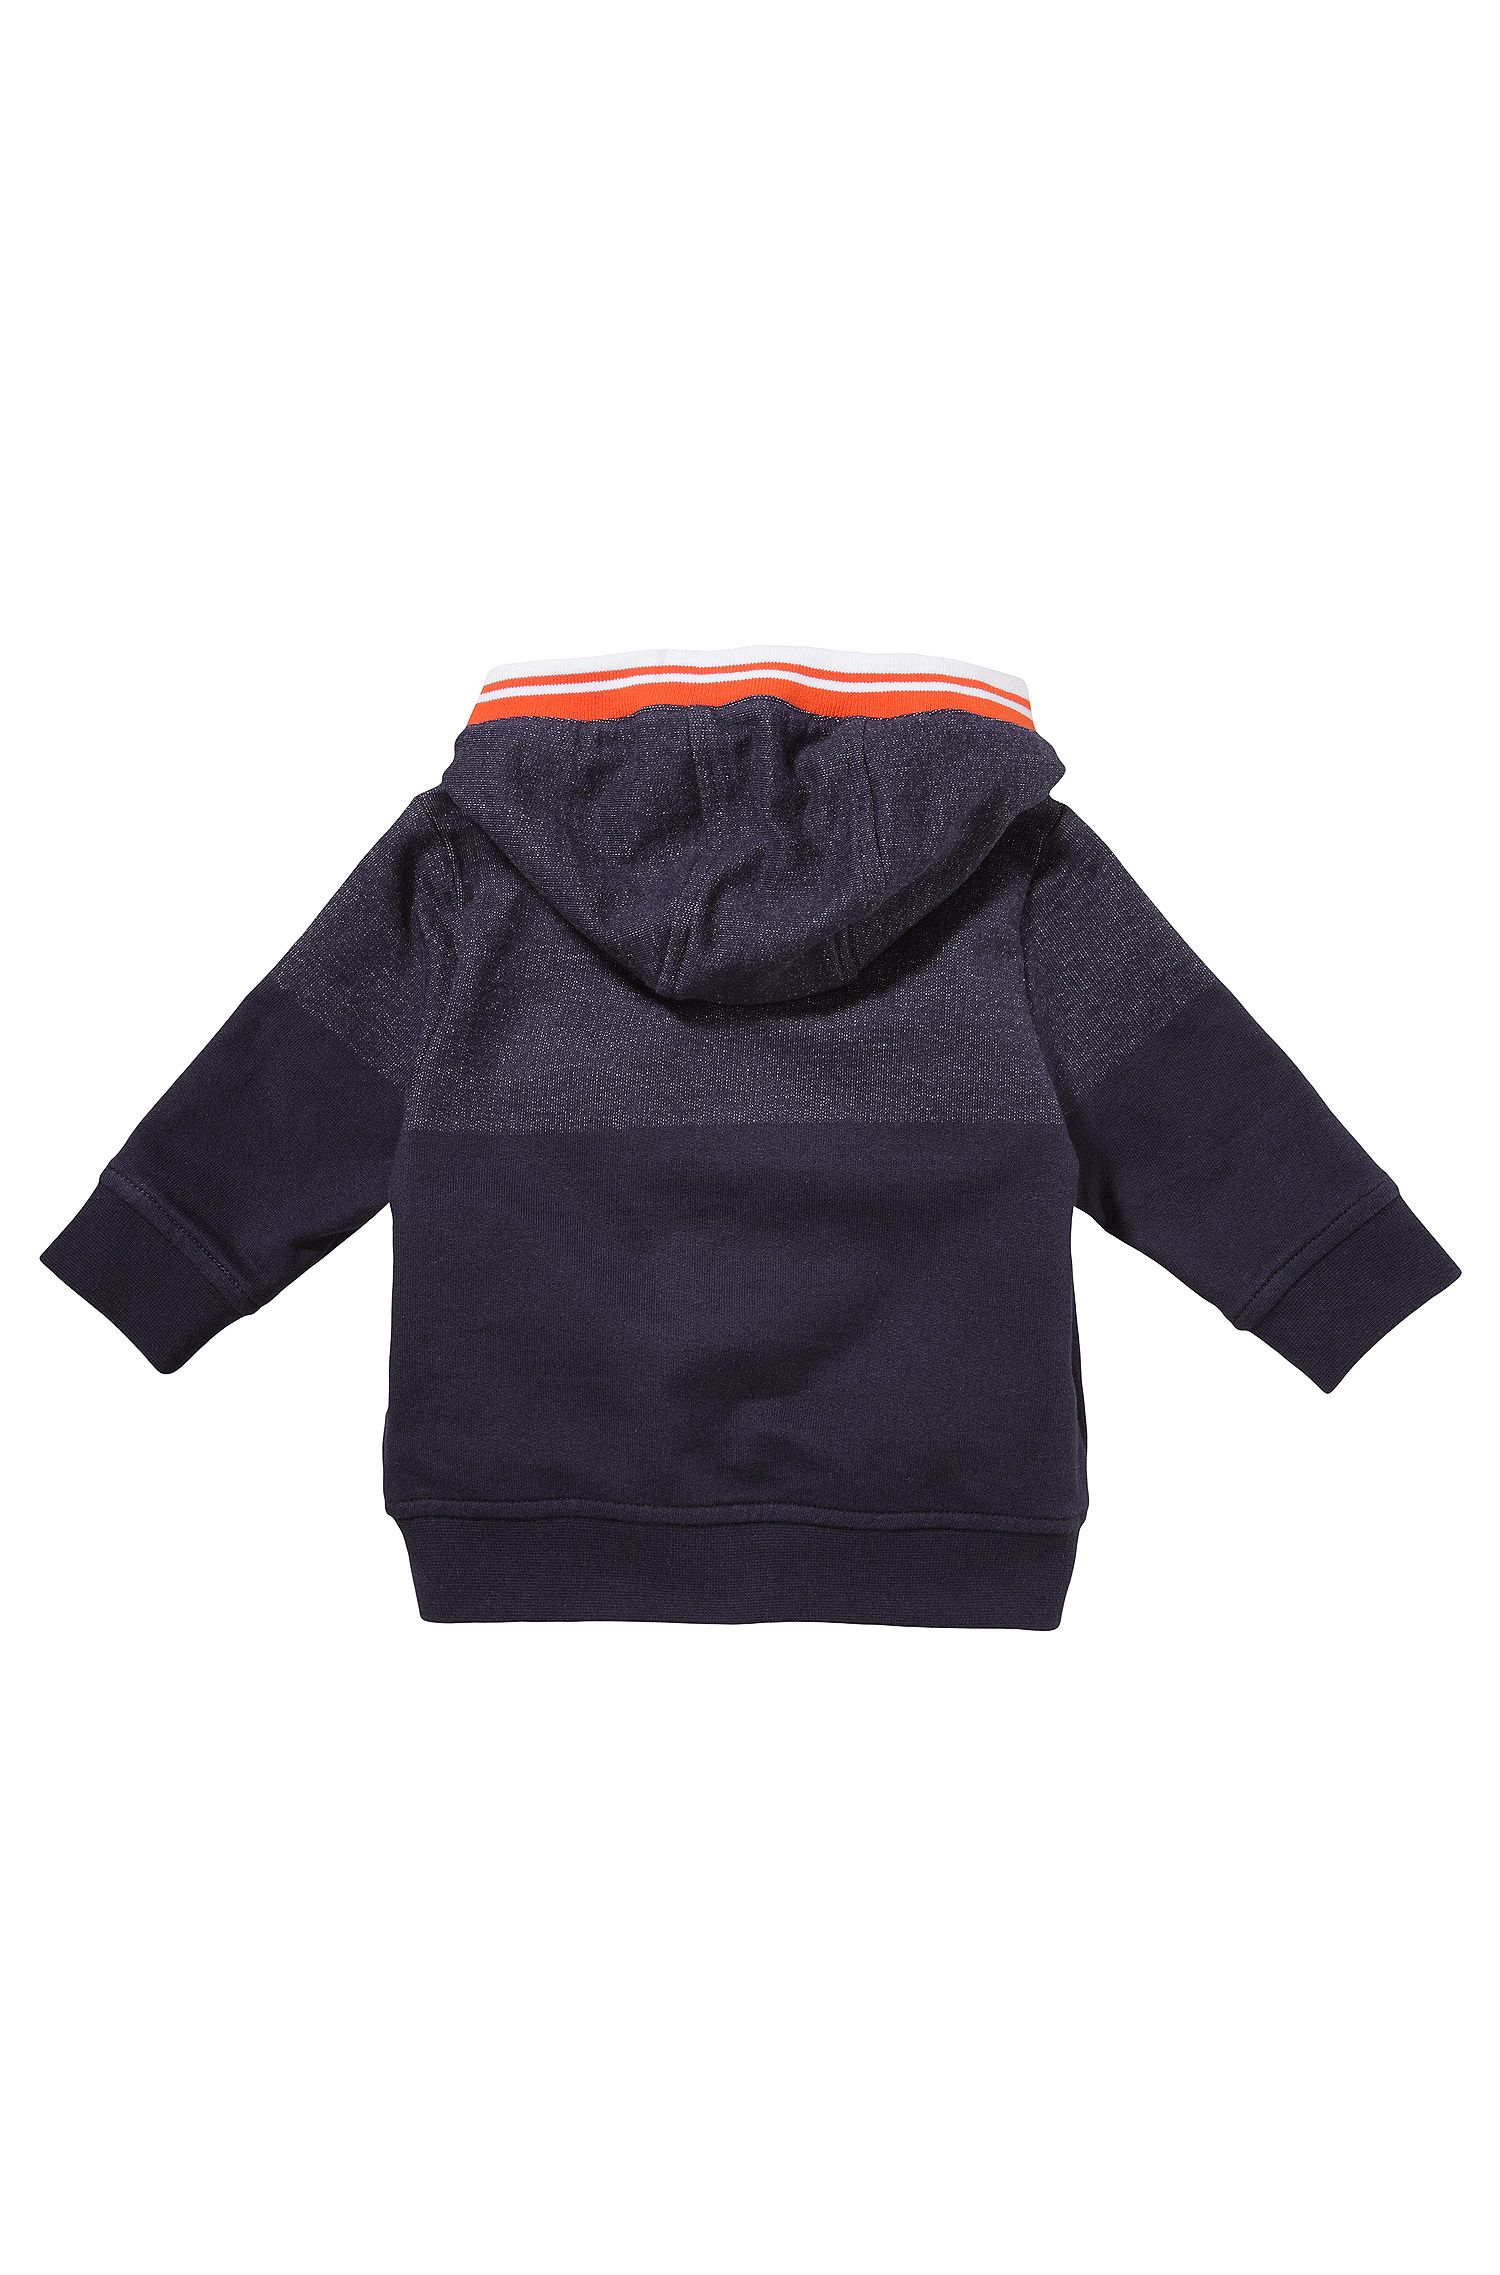 Kids-Kapuzen-Sweatshirt-Jacke ´J05371` aus Baumwolle